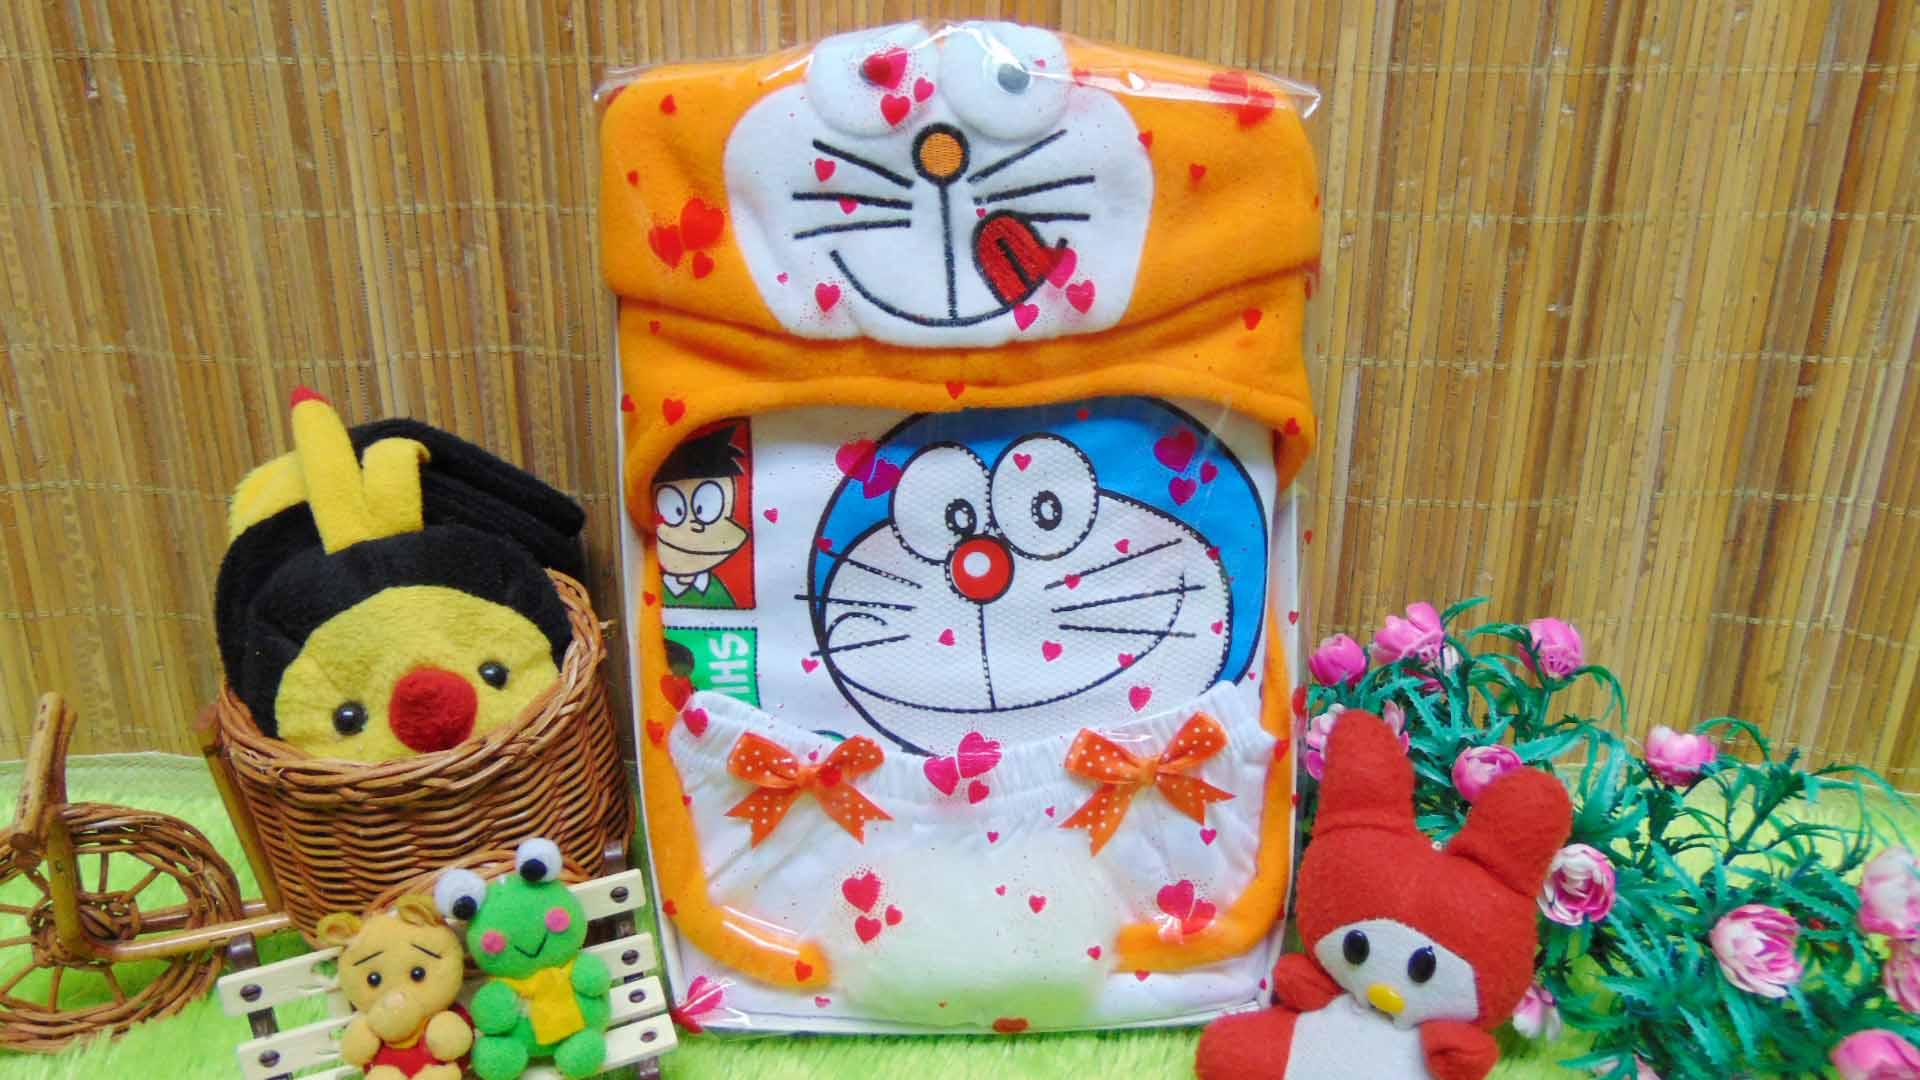 Kado Lahiran Paket Kado Bayi Baby Gift Box Doraemon Orange Timbul 65 terdiri dari setelan kaos doraemon sablon timbul dan topi doraemon lucu,FREE KARTU UCAPAN